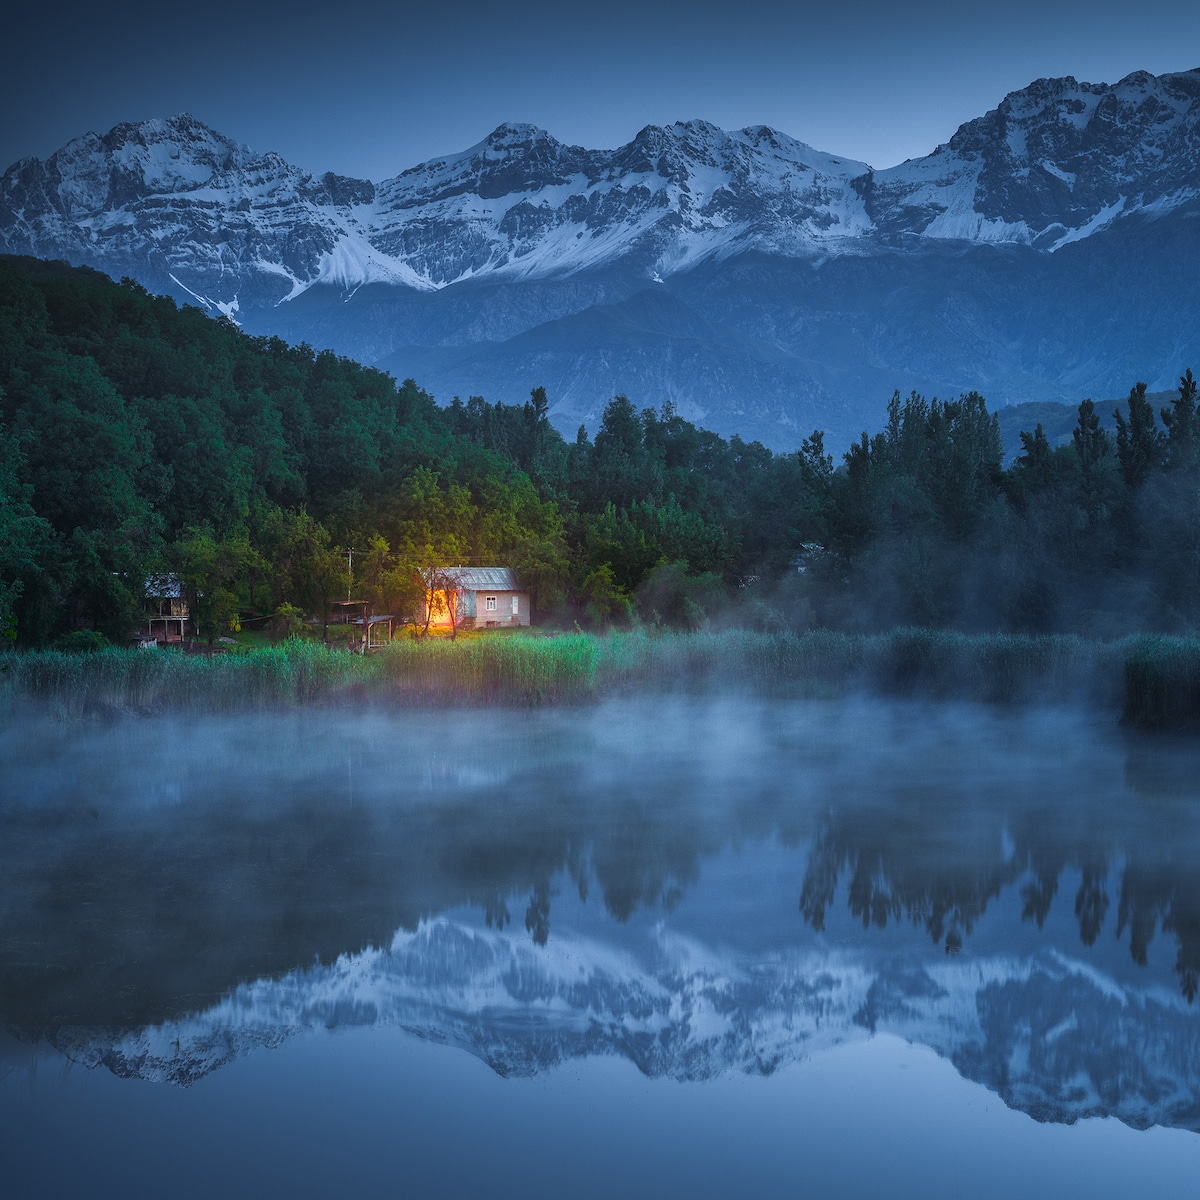 Lakeside Home in Kyrgyzstan by Albert Dros